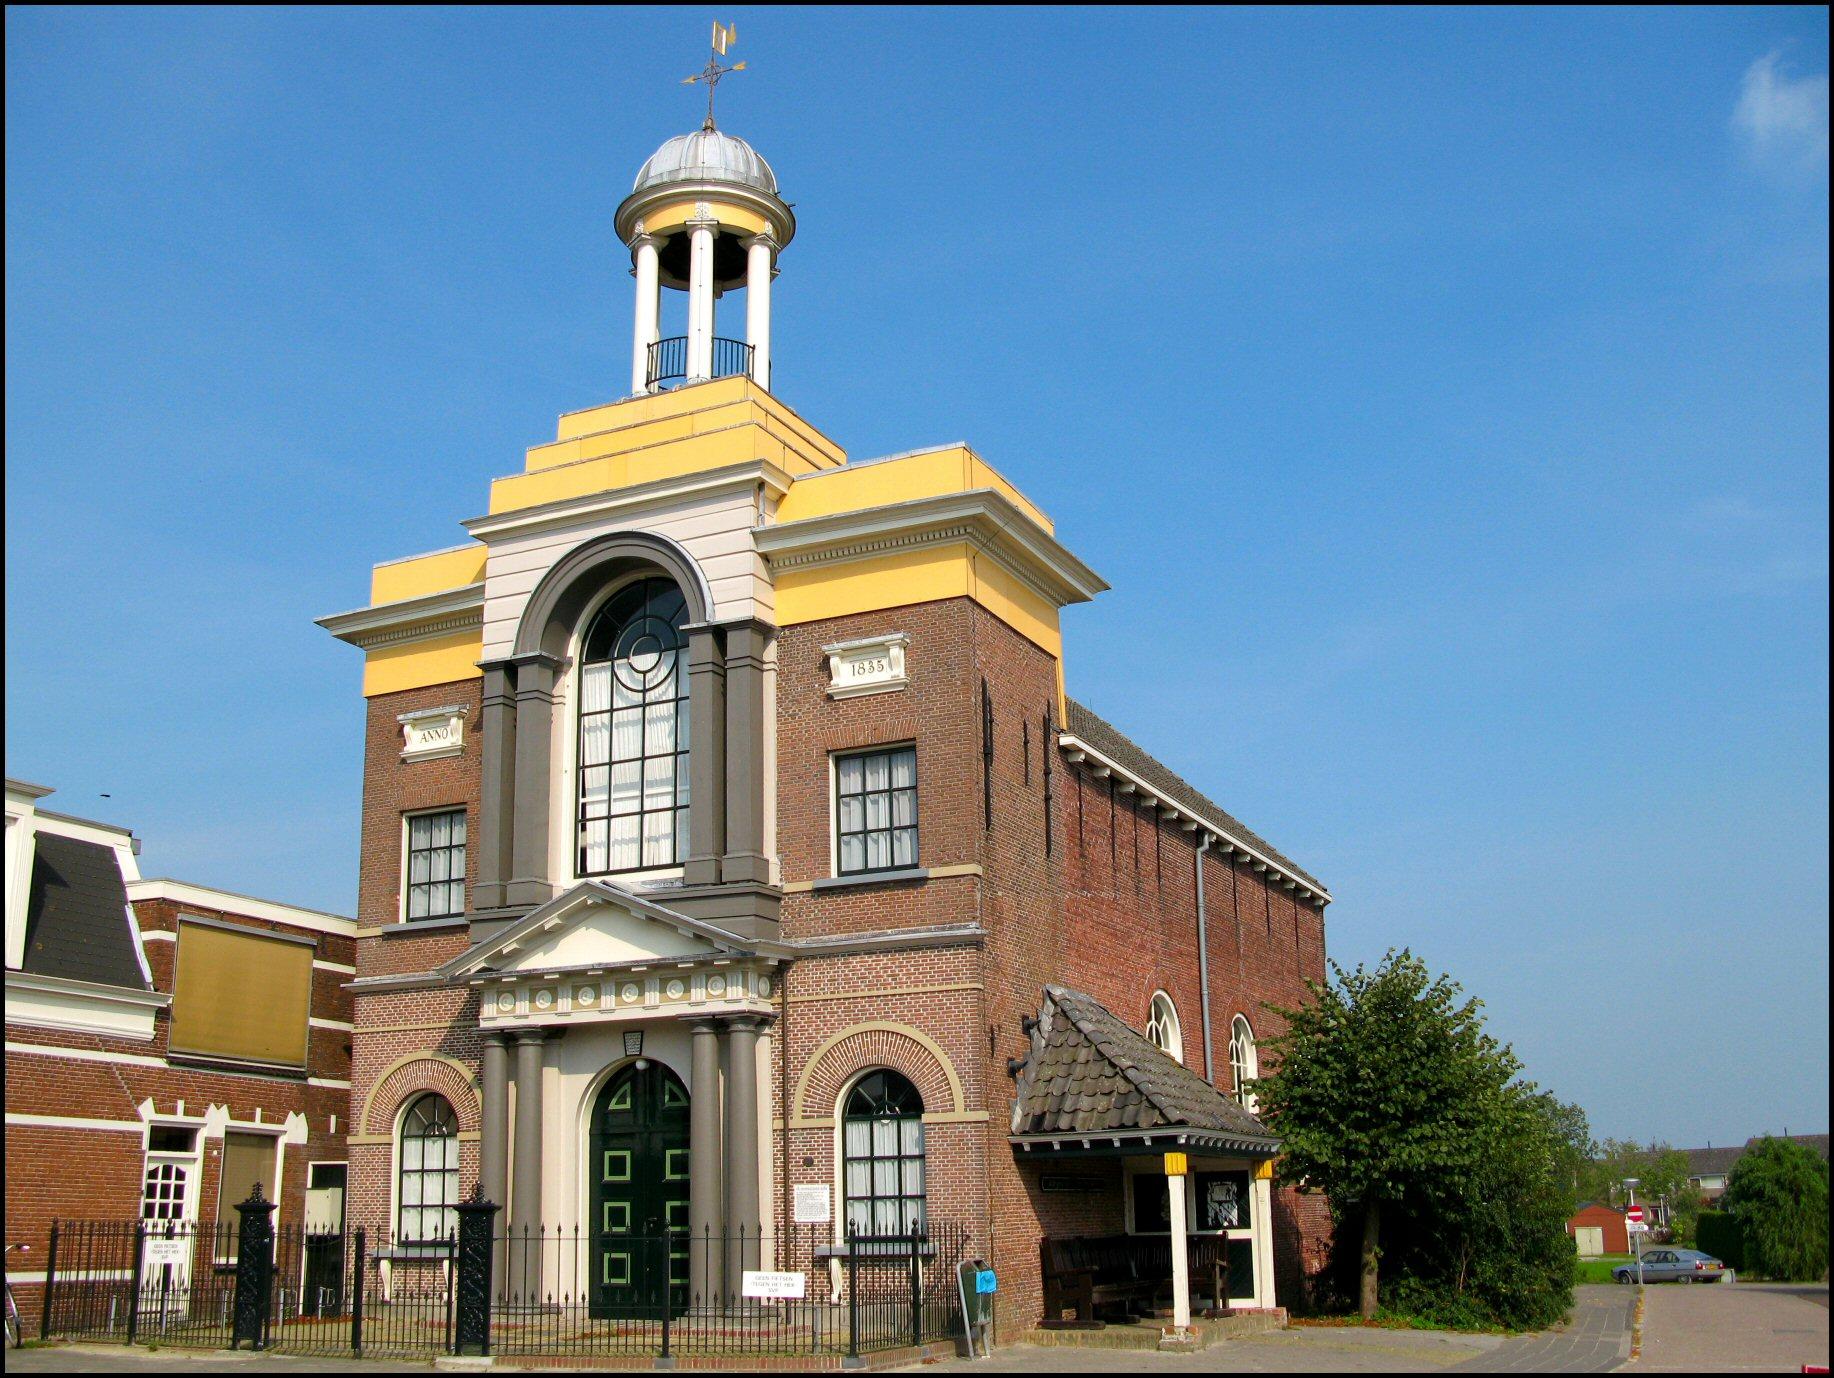 Doopsgezinde kerk Akkrum